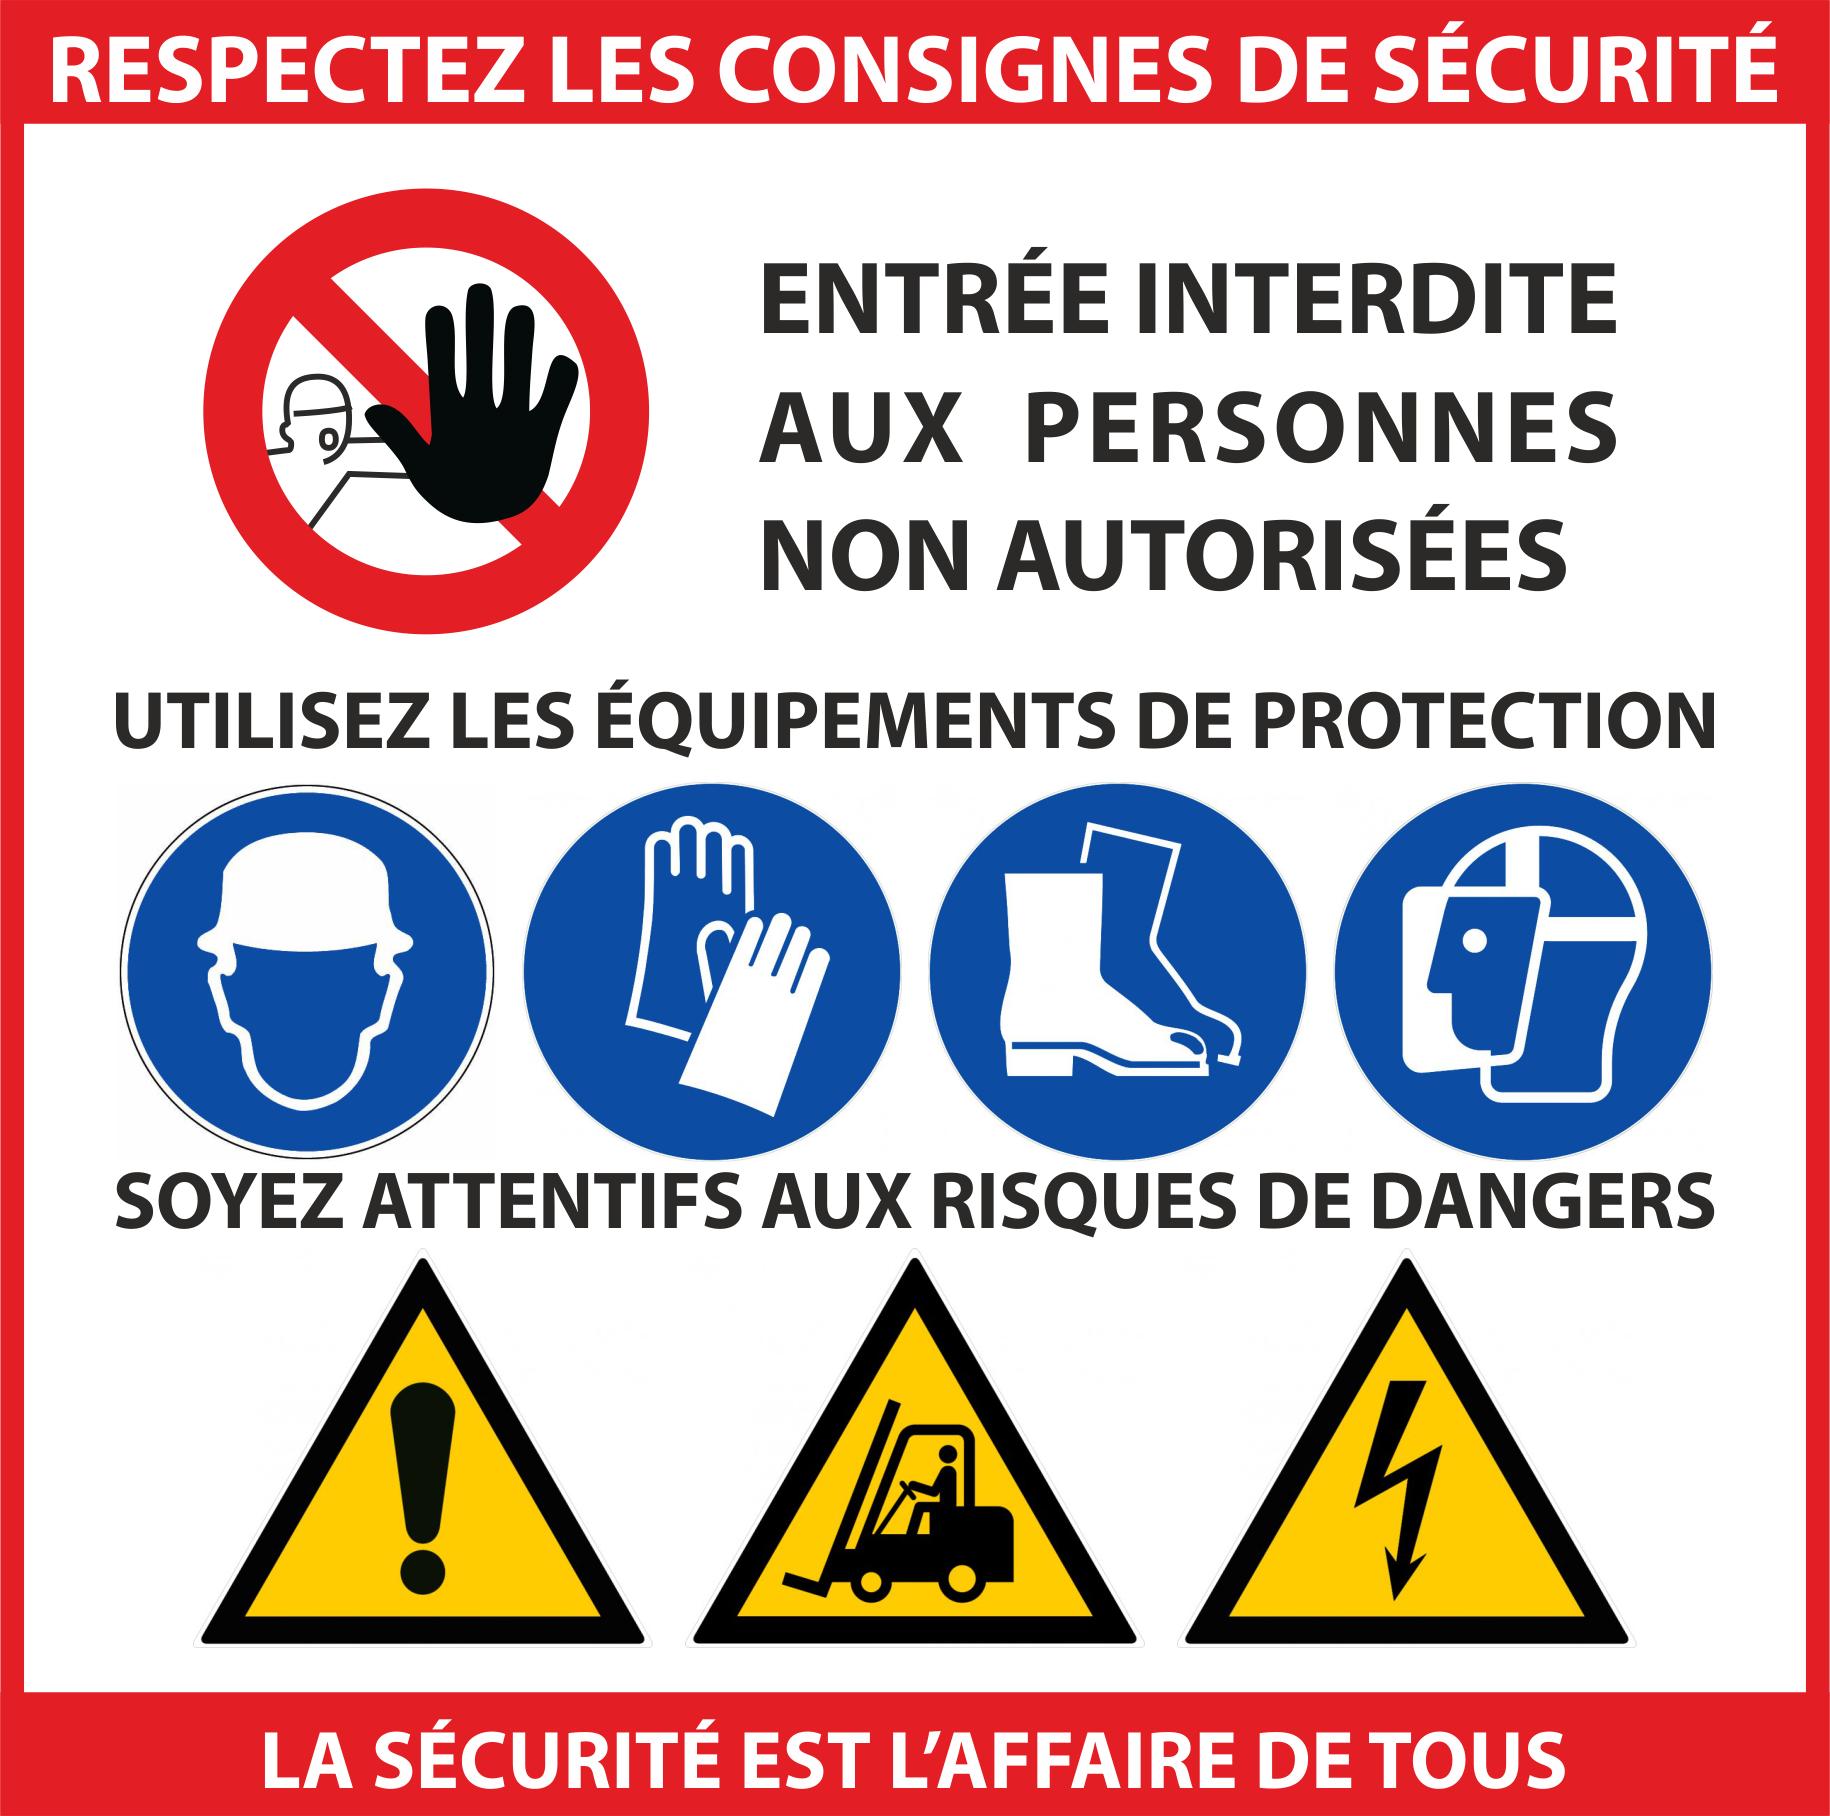 ae75a18ef90 respectez-les-consignes-de-securite.jpg